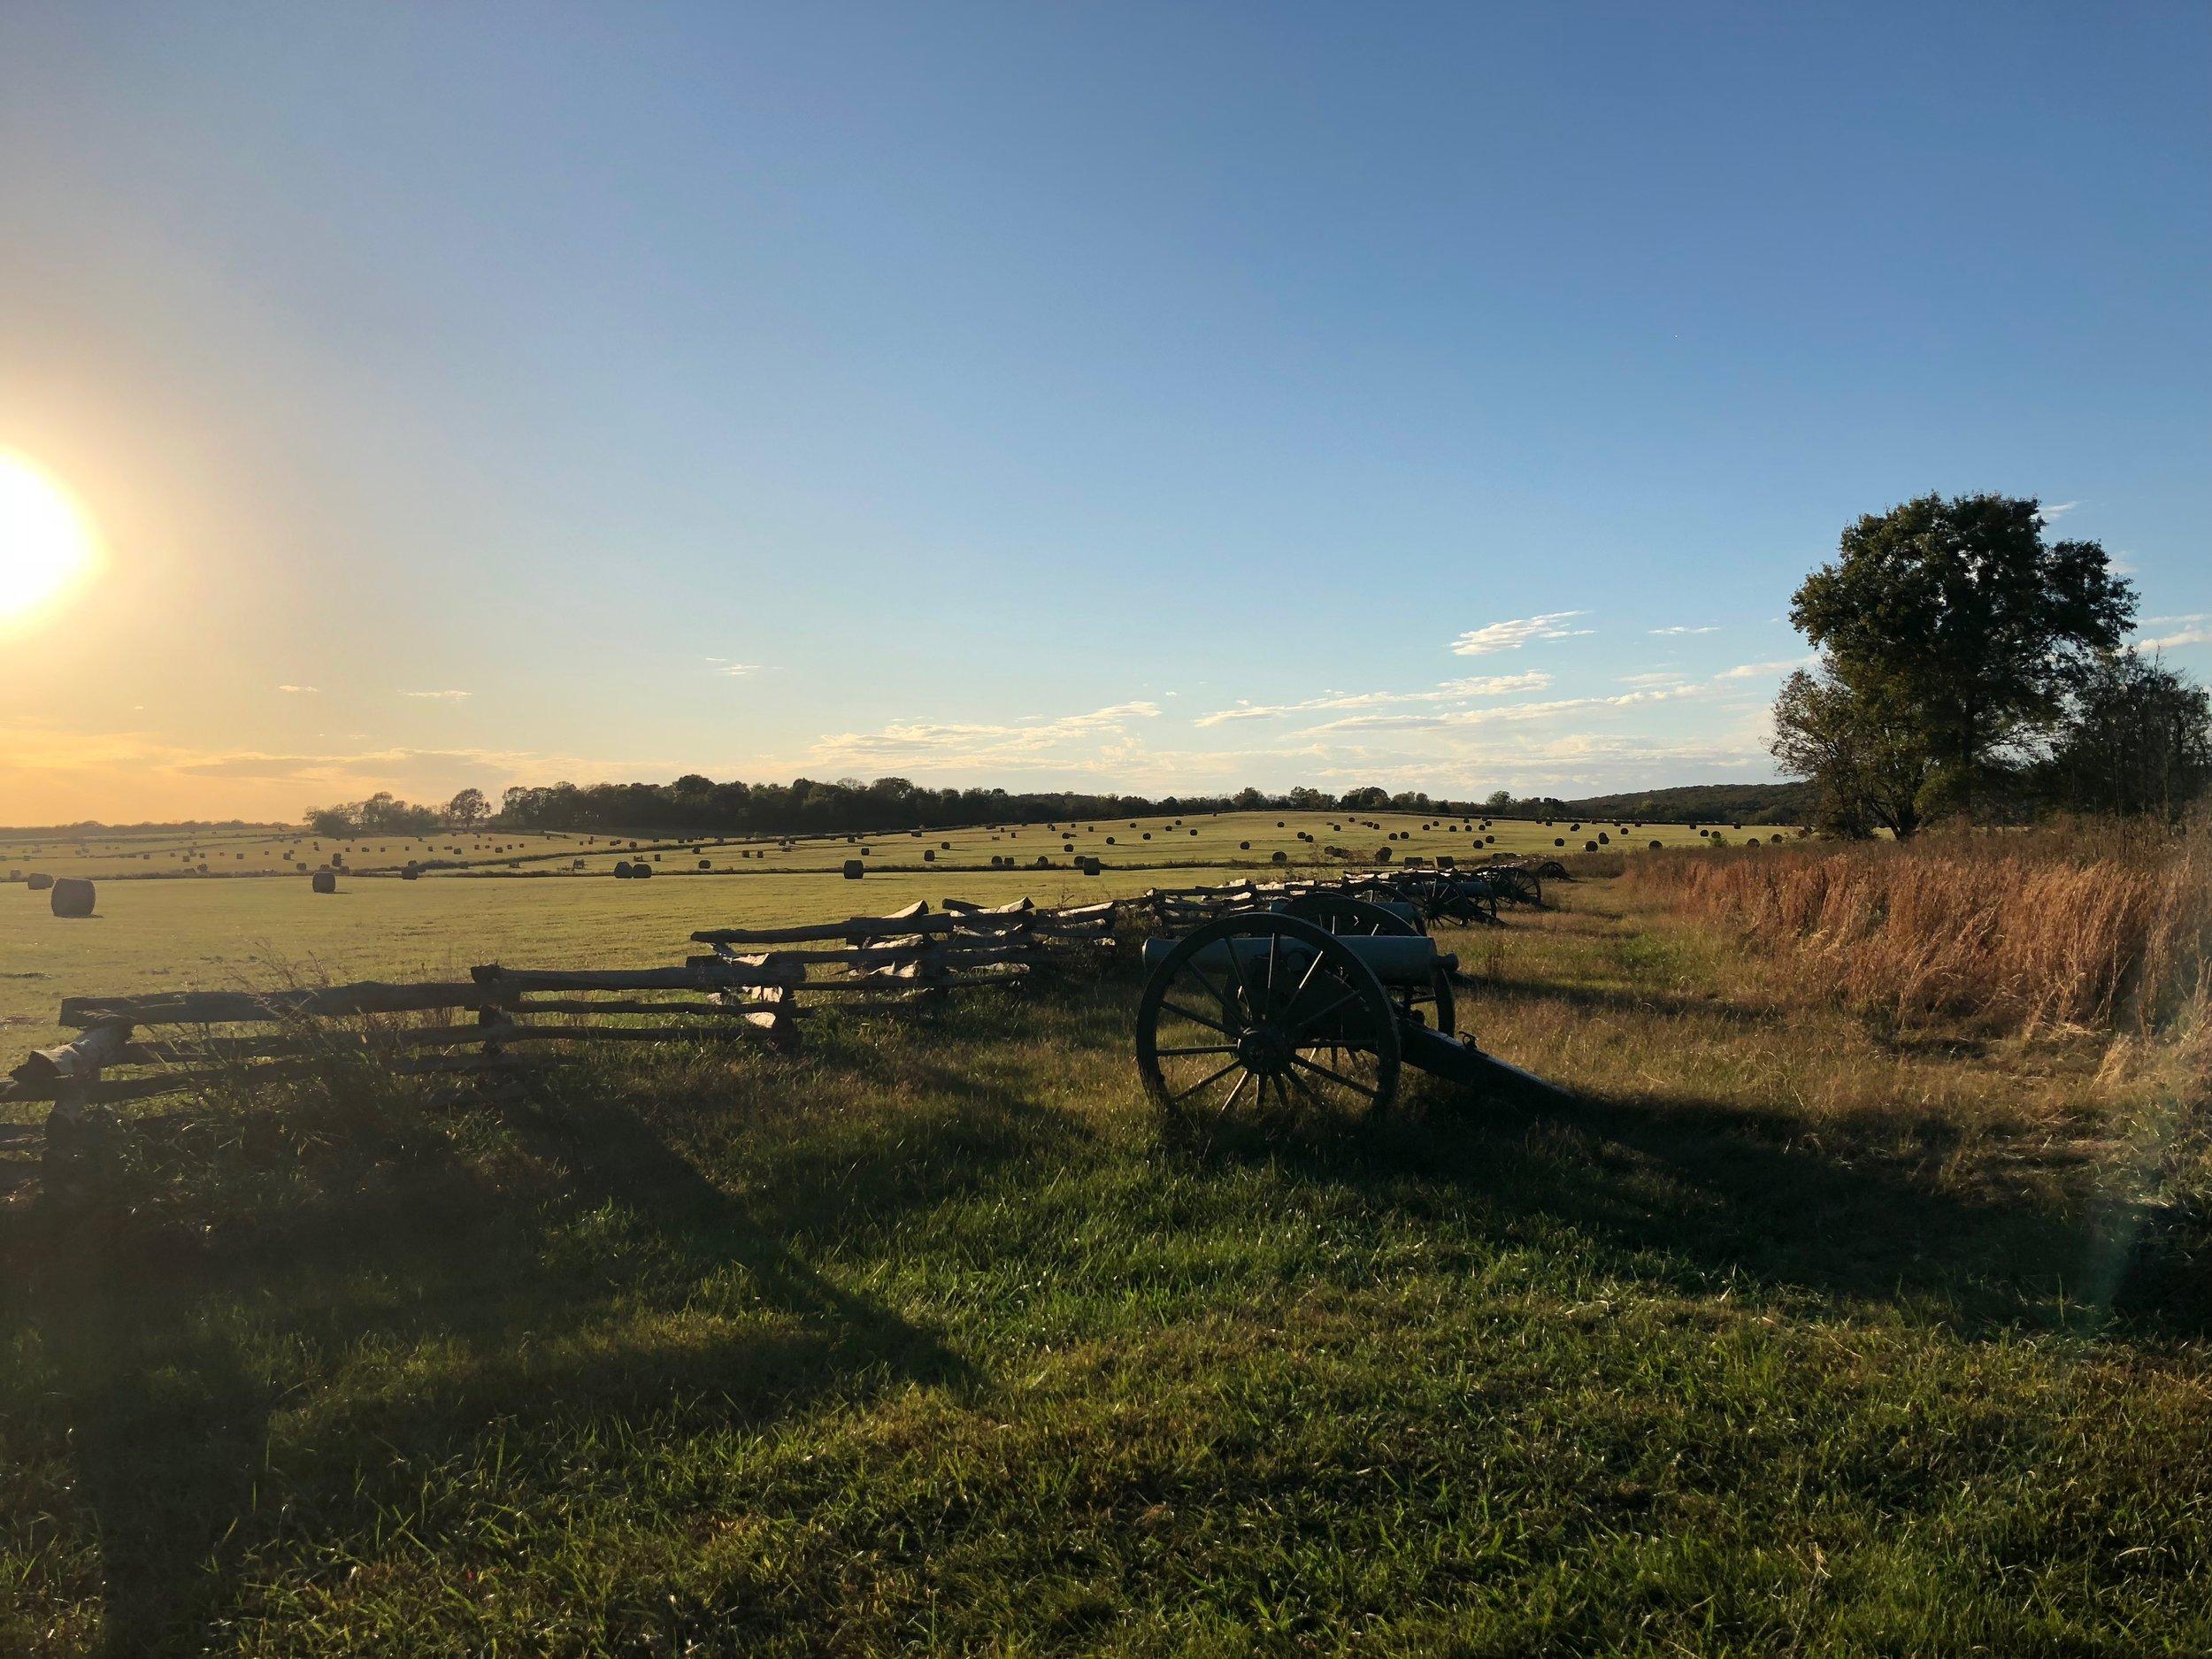 Pea Ridge battleground